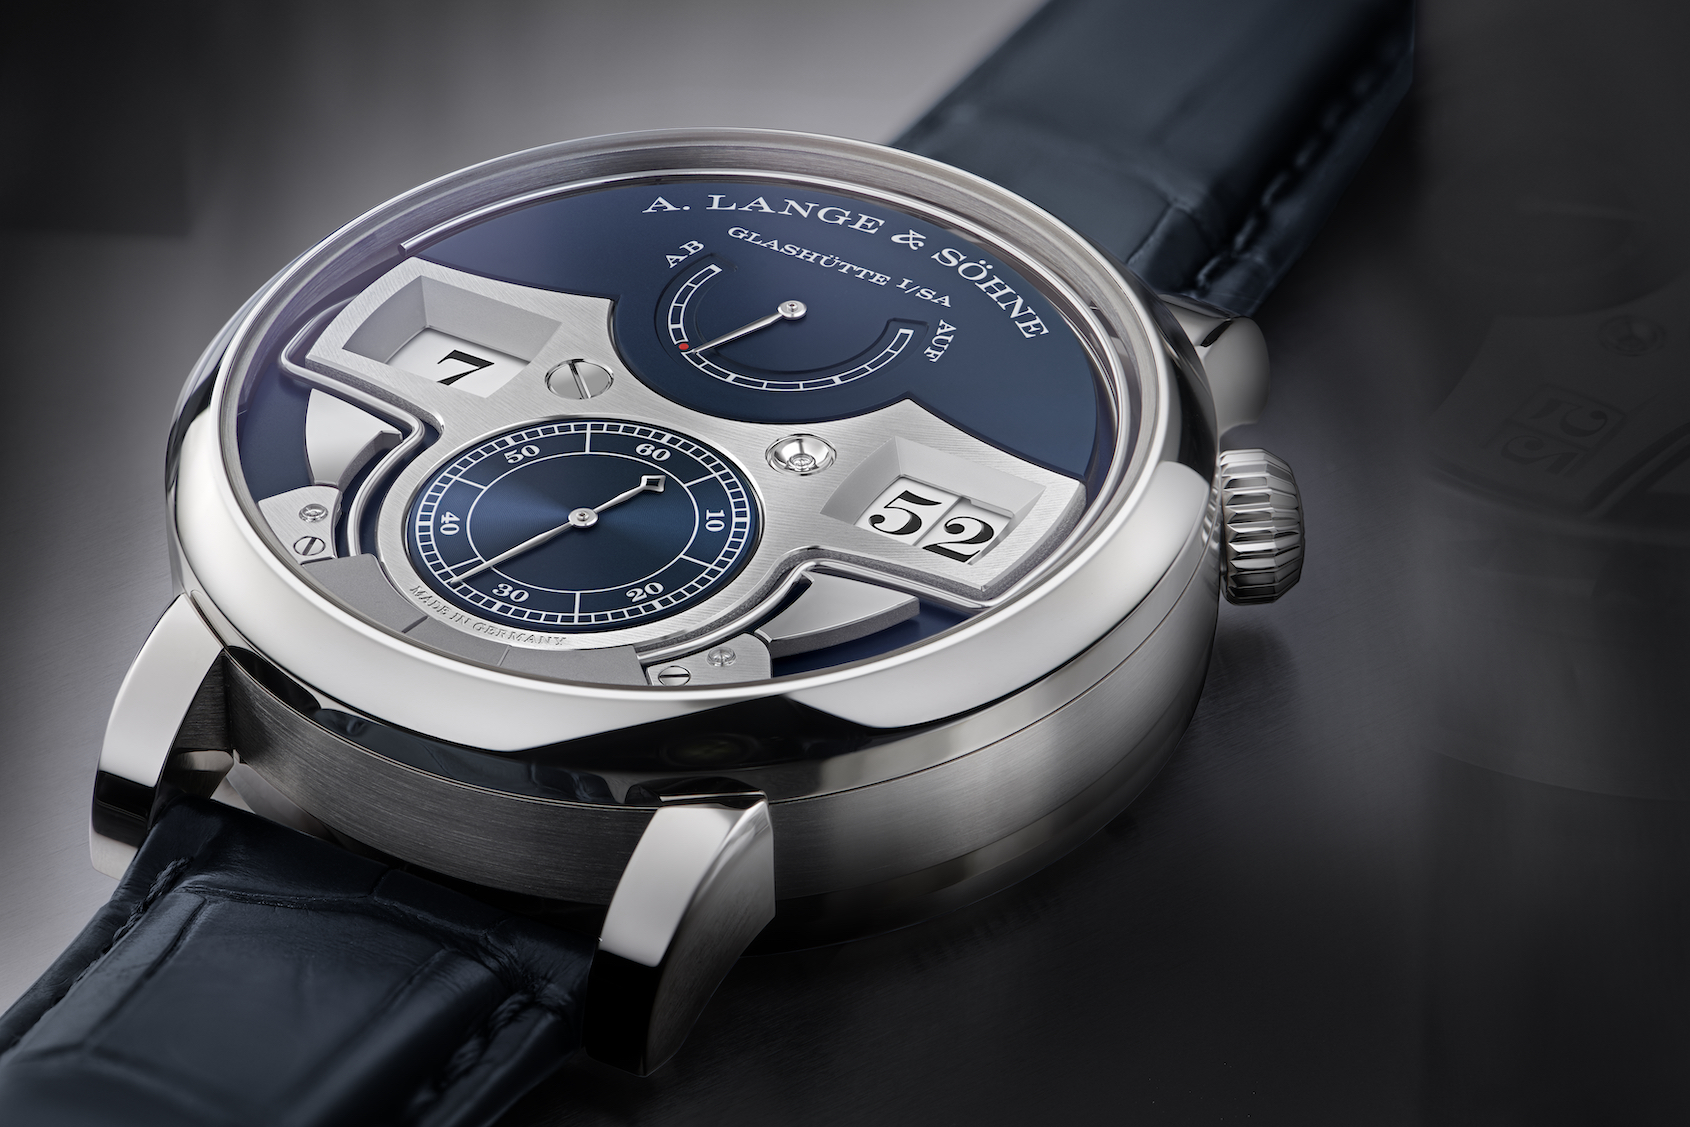 O Topo 5 relógios de luxo de 2020 (até agora!) Relógios de luxo Os 5 melhores relógios de luxo de 2020 (até agora!) Os 5 melhores relógios de luxo de 2020 até agora 4 cores pantone do ano Design Ideas com 2021 & # 8217; s cor pantone de O ano, cinza definitivo e iluminador Os 5 melhores relógios de luxo de 2020 até agora 4